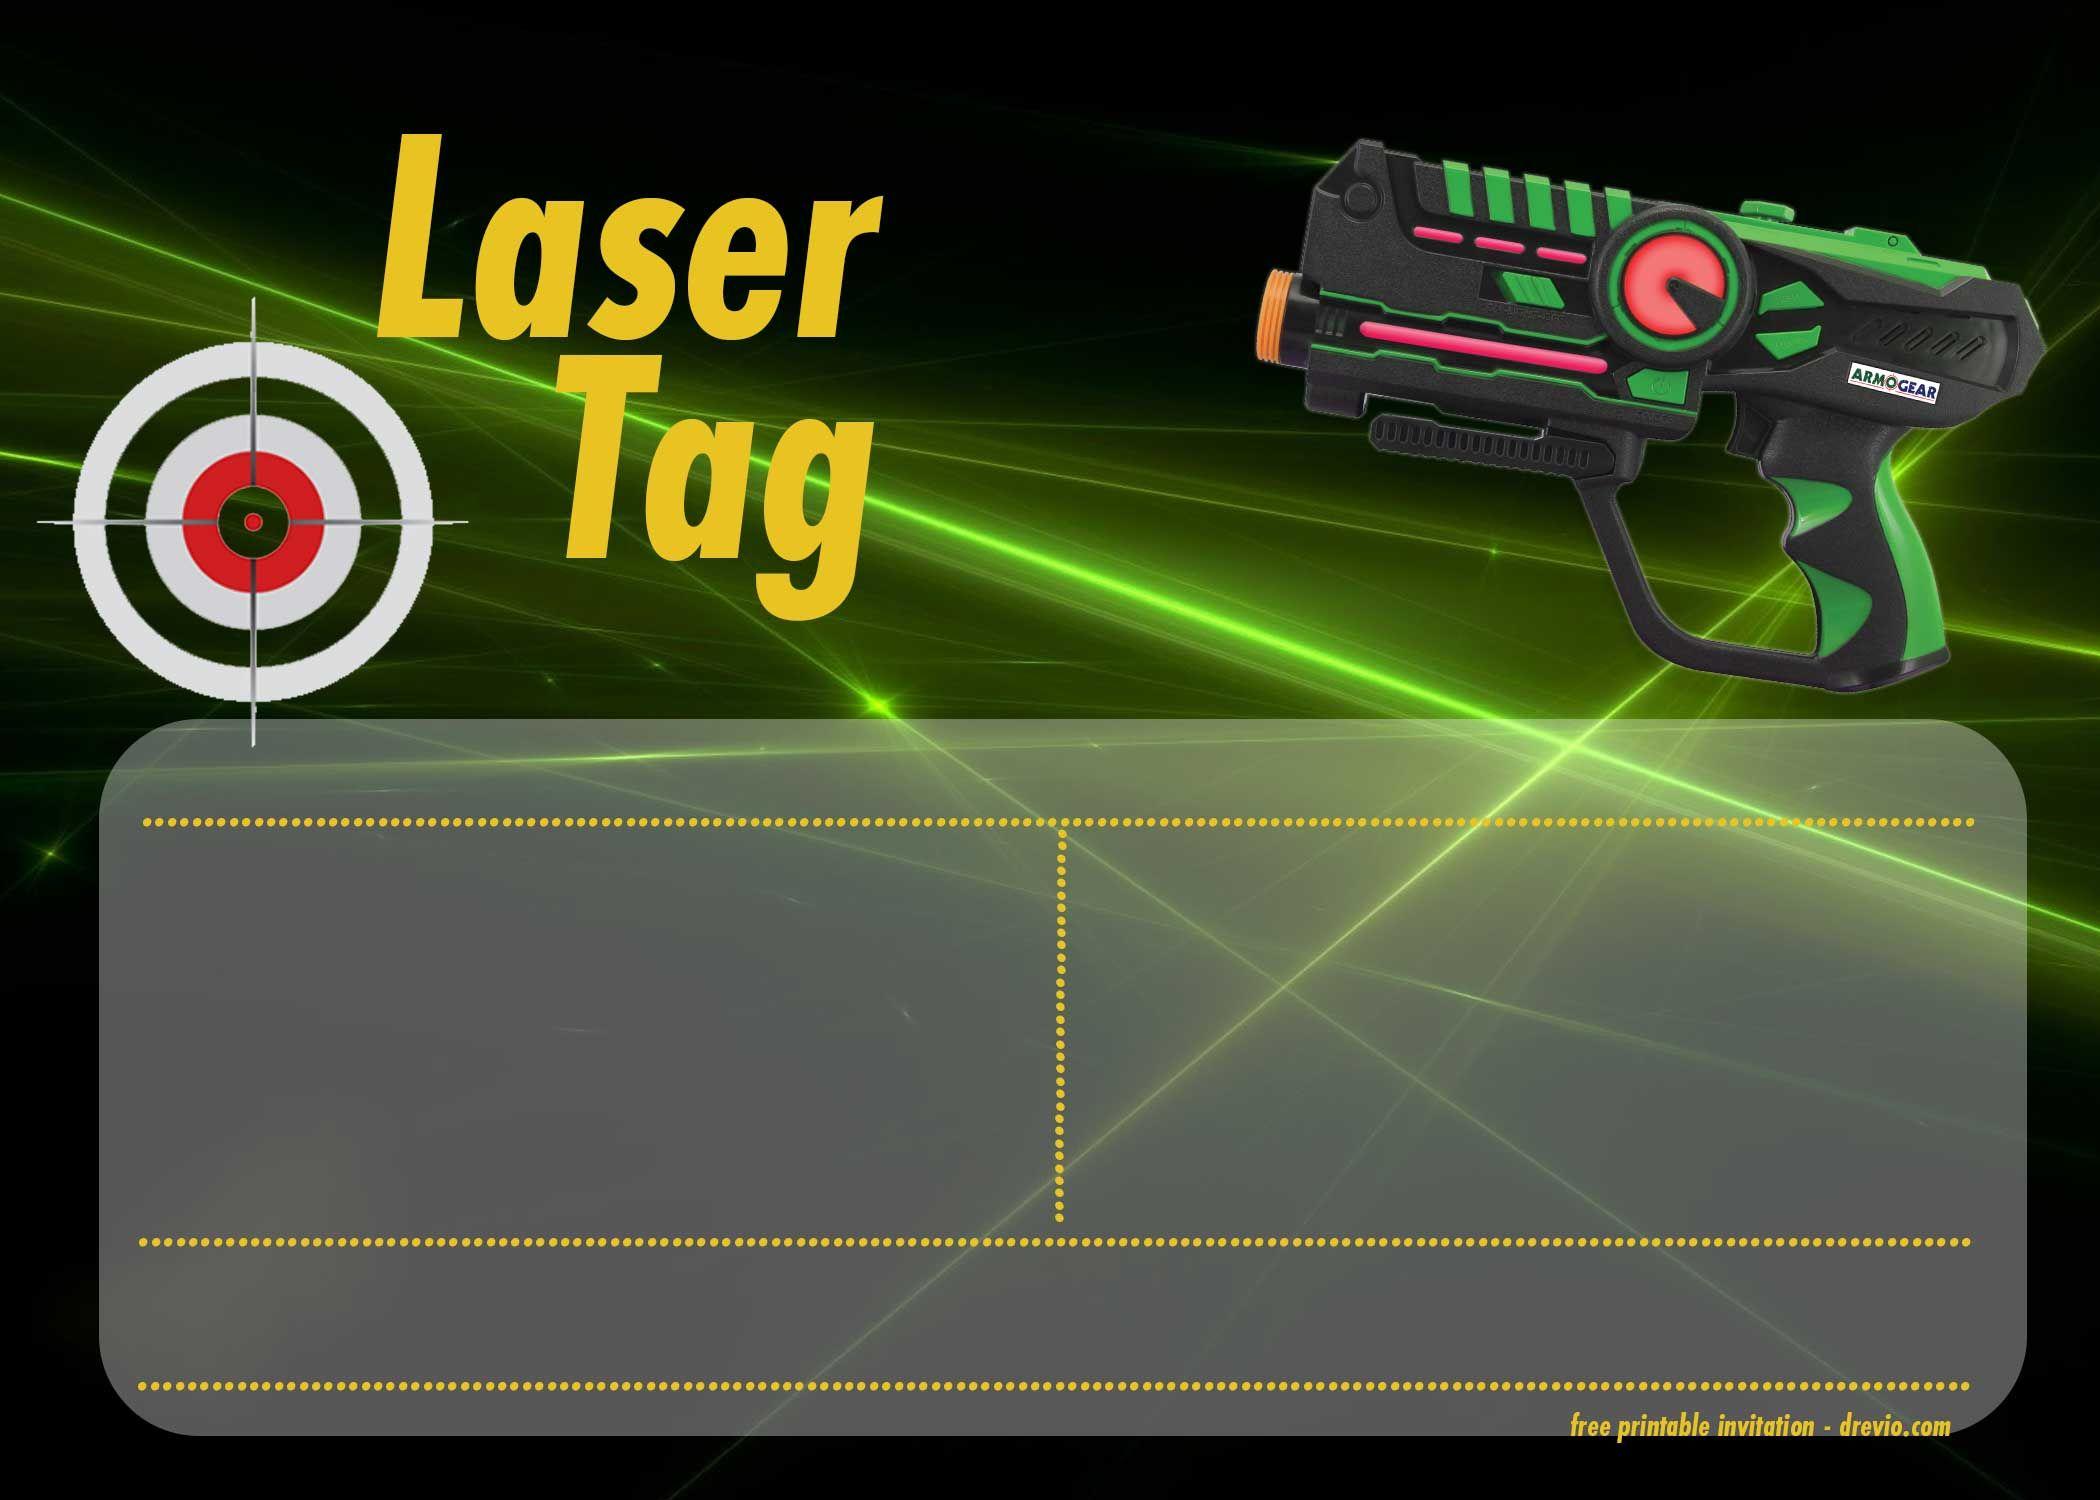 Free Printable Laser Tag Invitation Templates | Boys Party Ideas - Free Printable Laser Tag Invitation Template